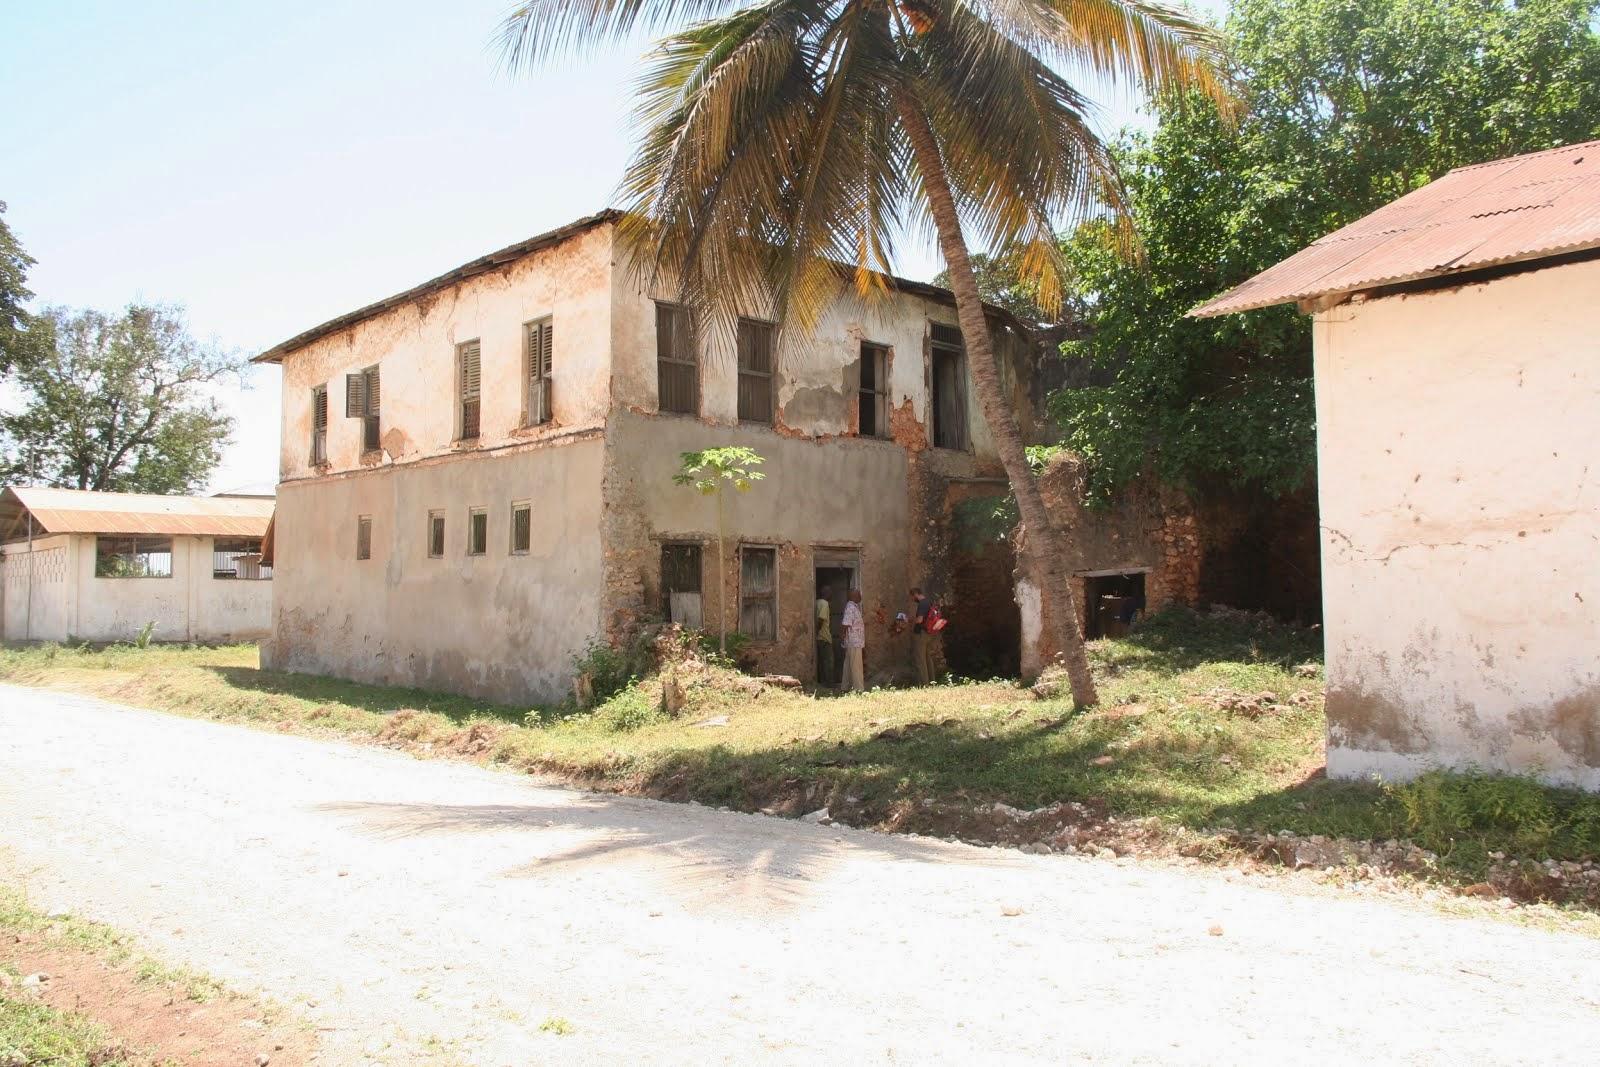 Old stone town of Pangani